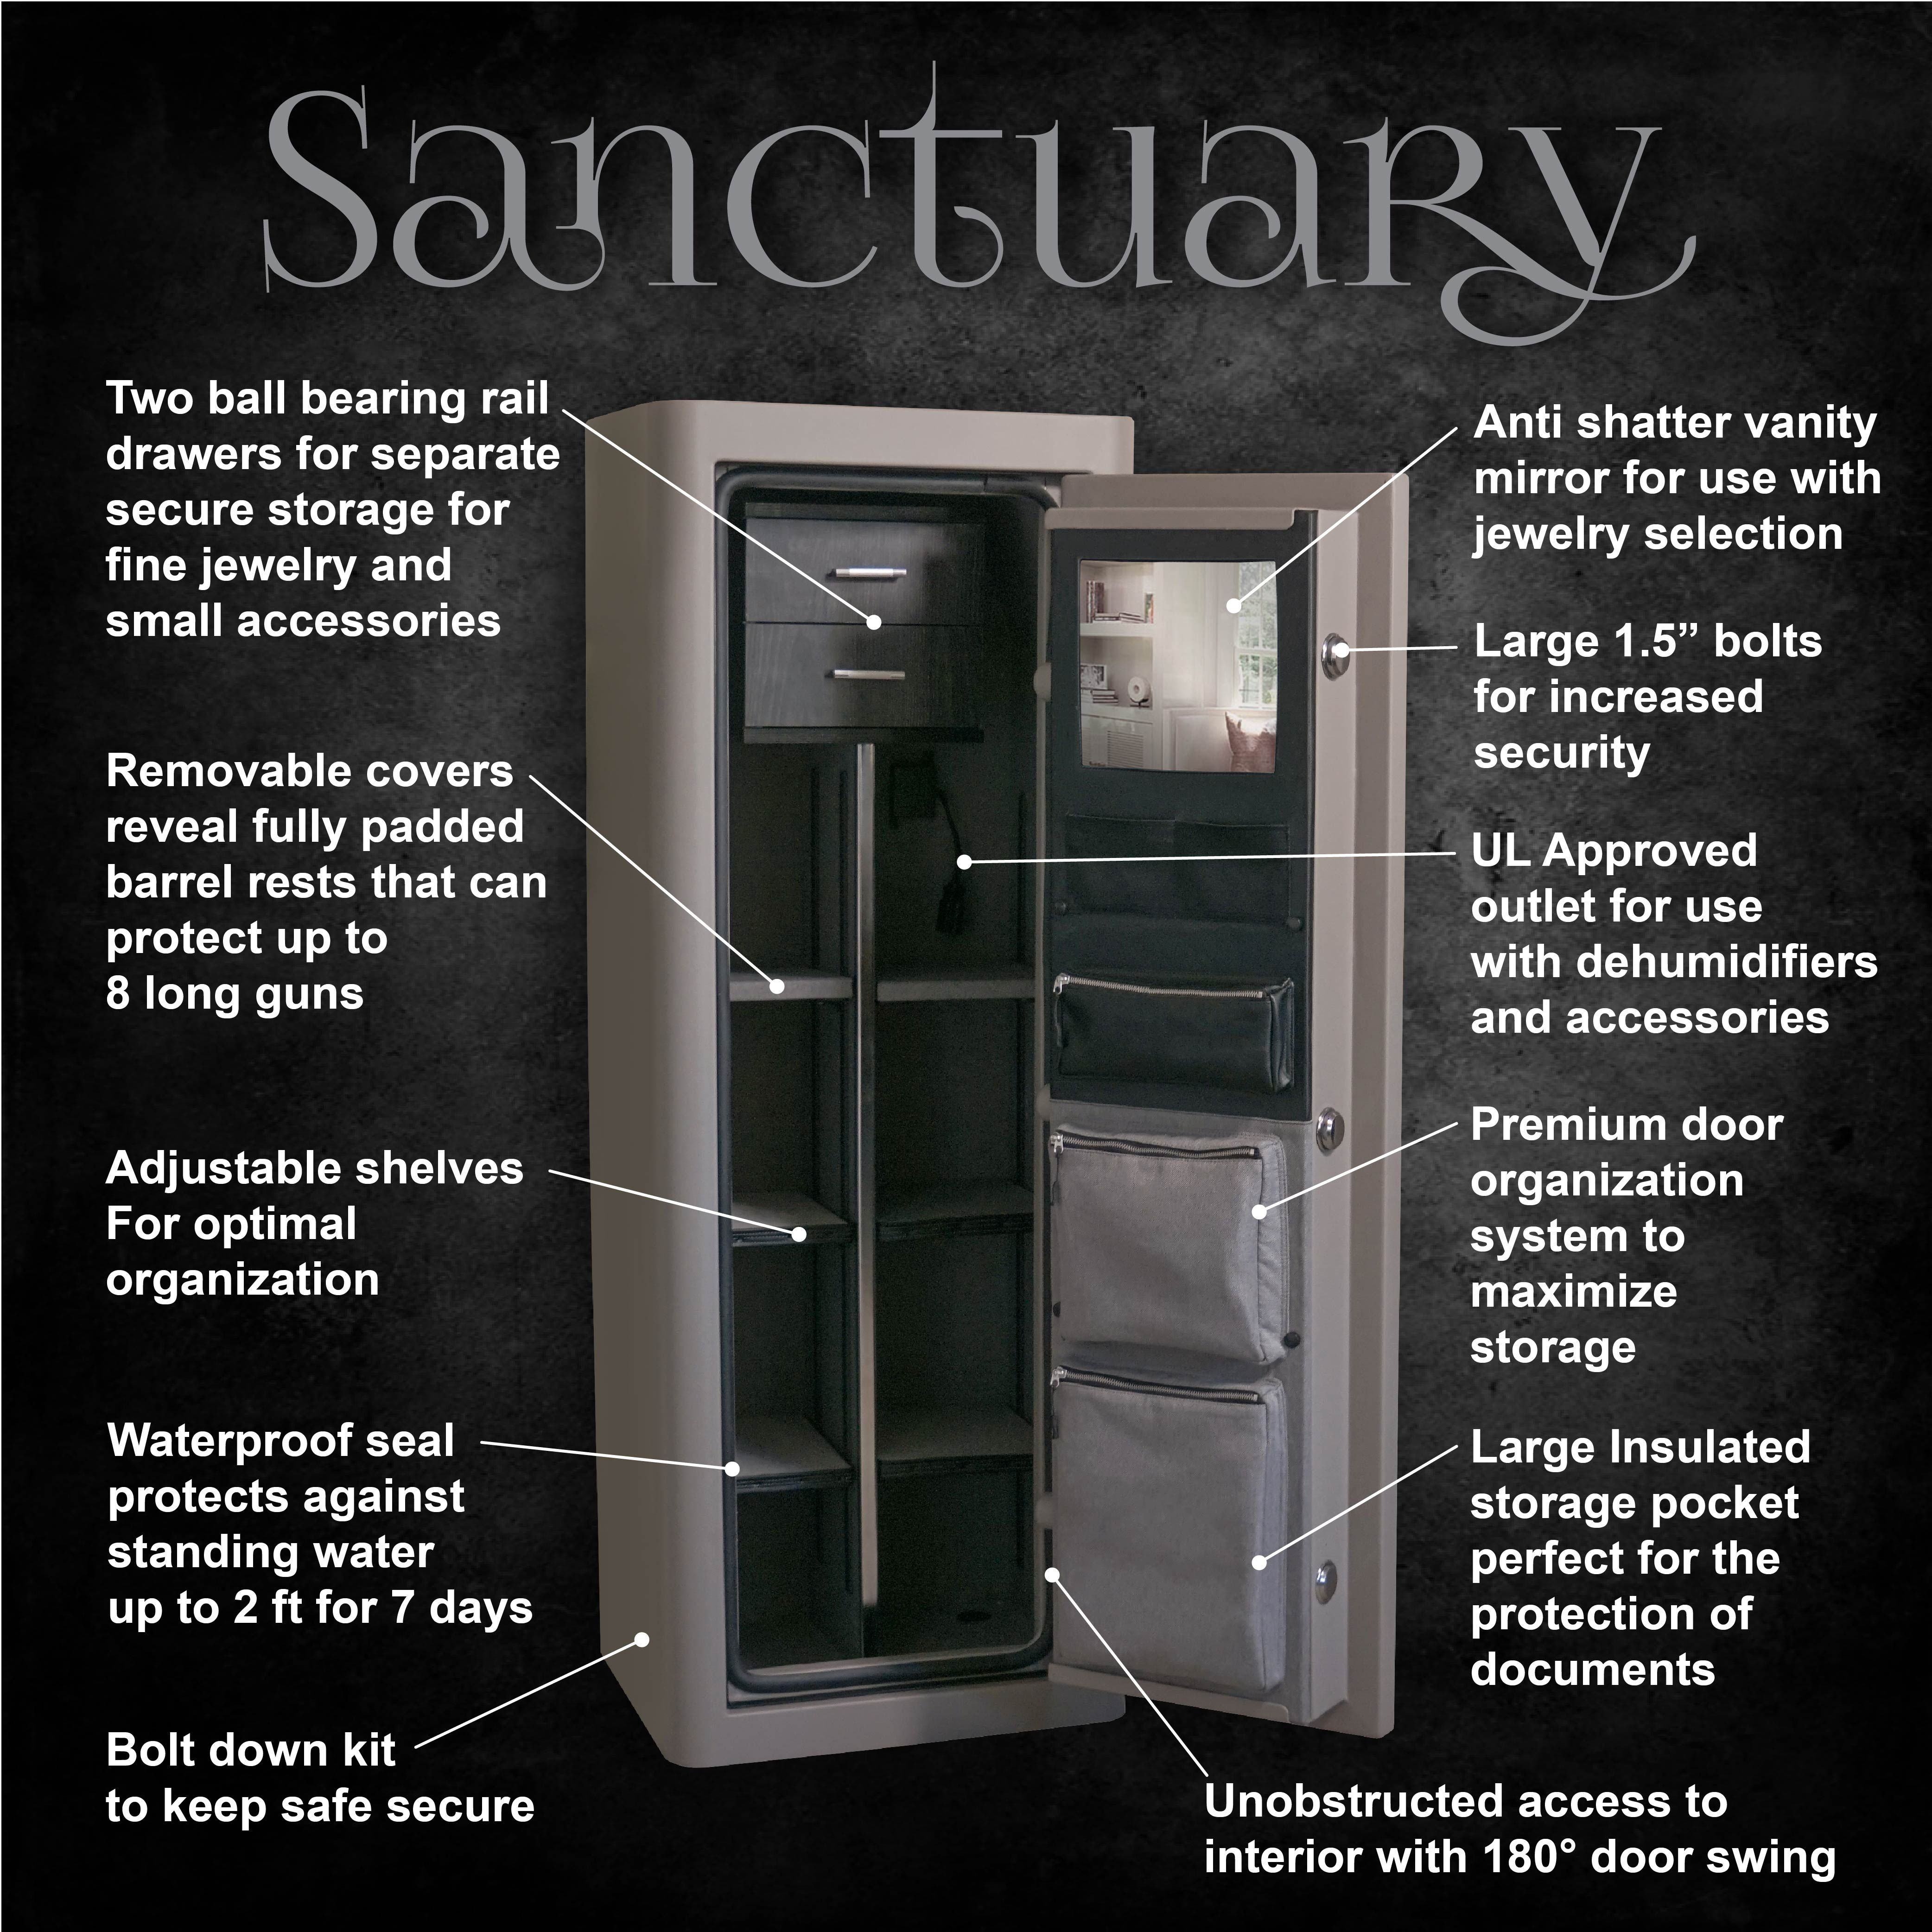 Sports Afield Sanctuary Executive Vault 10 82CUFT